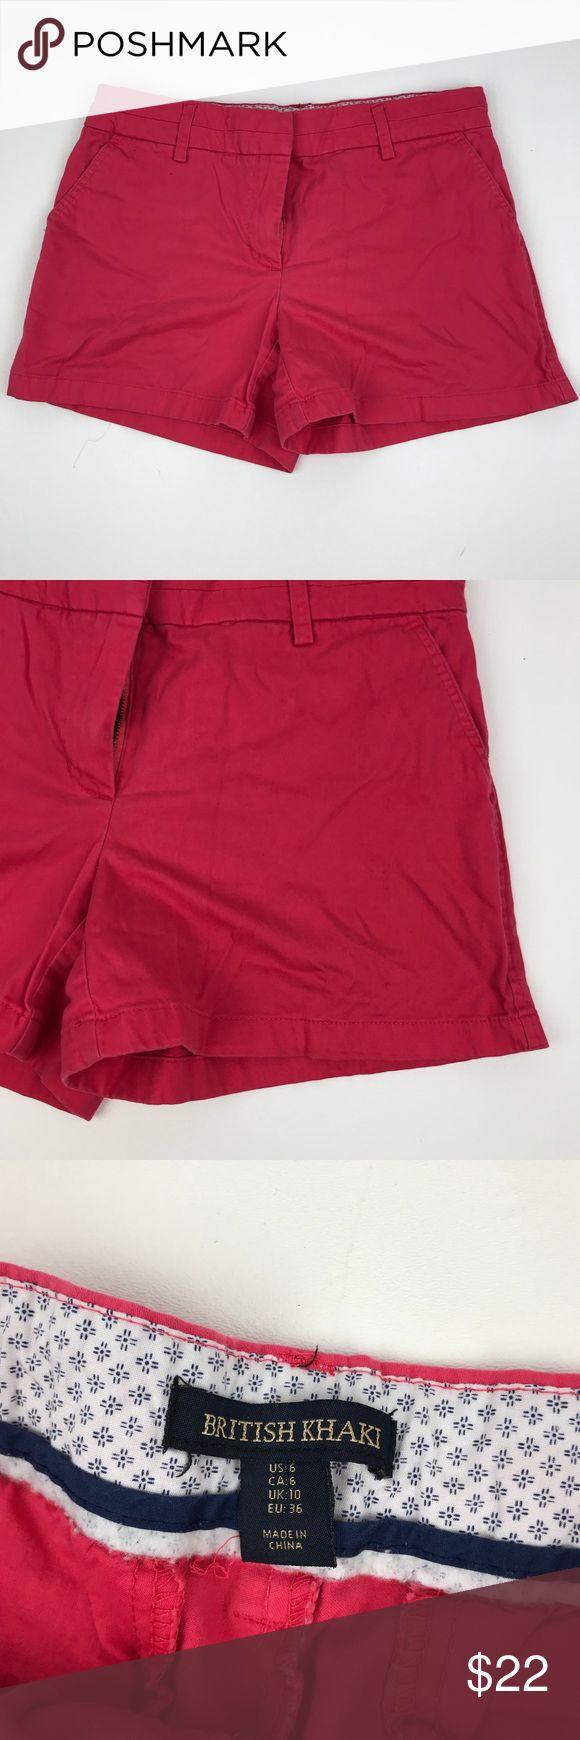 "BRITISH KHAKI Pink Shorts Size 6 Summer Spring S British Khaki pink shorts  Size 6   Waist (taken flat): 15.5""  Leg opening (flat): 11""  Rise: 11"" British Khaki Shorts"